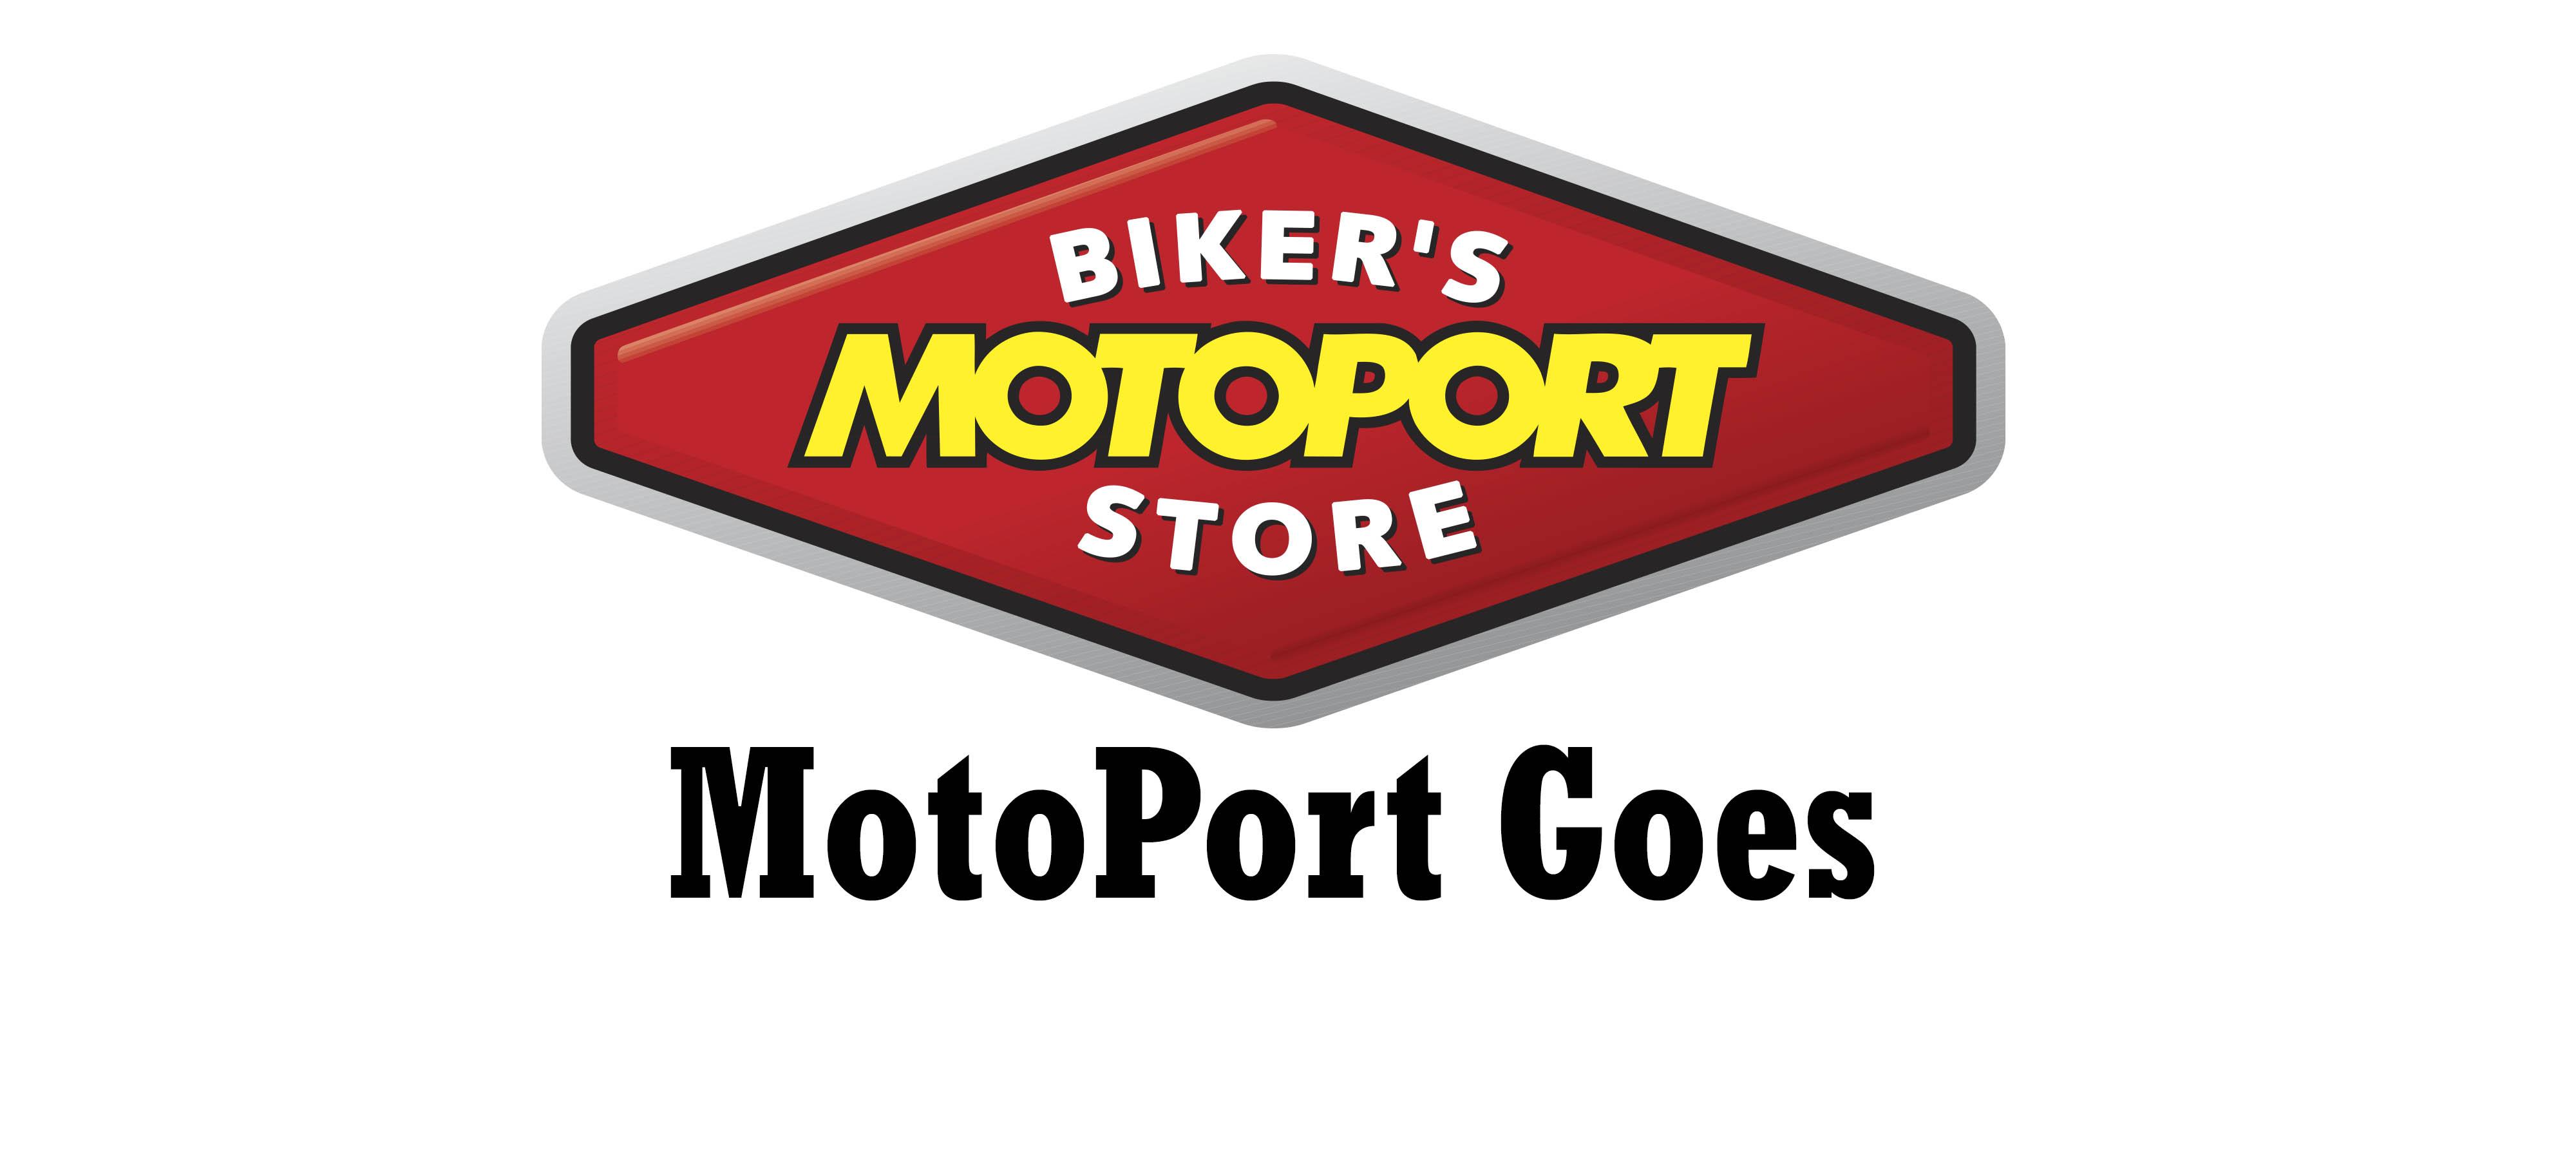 motoport goes